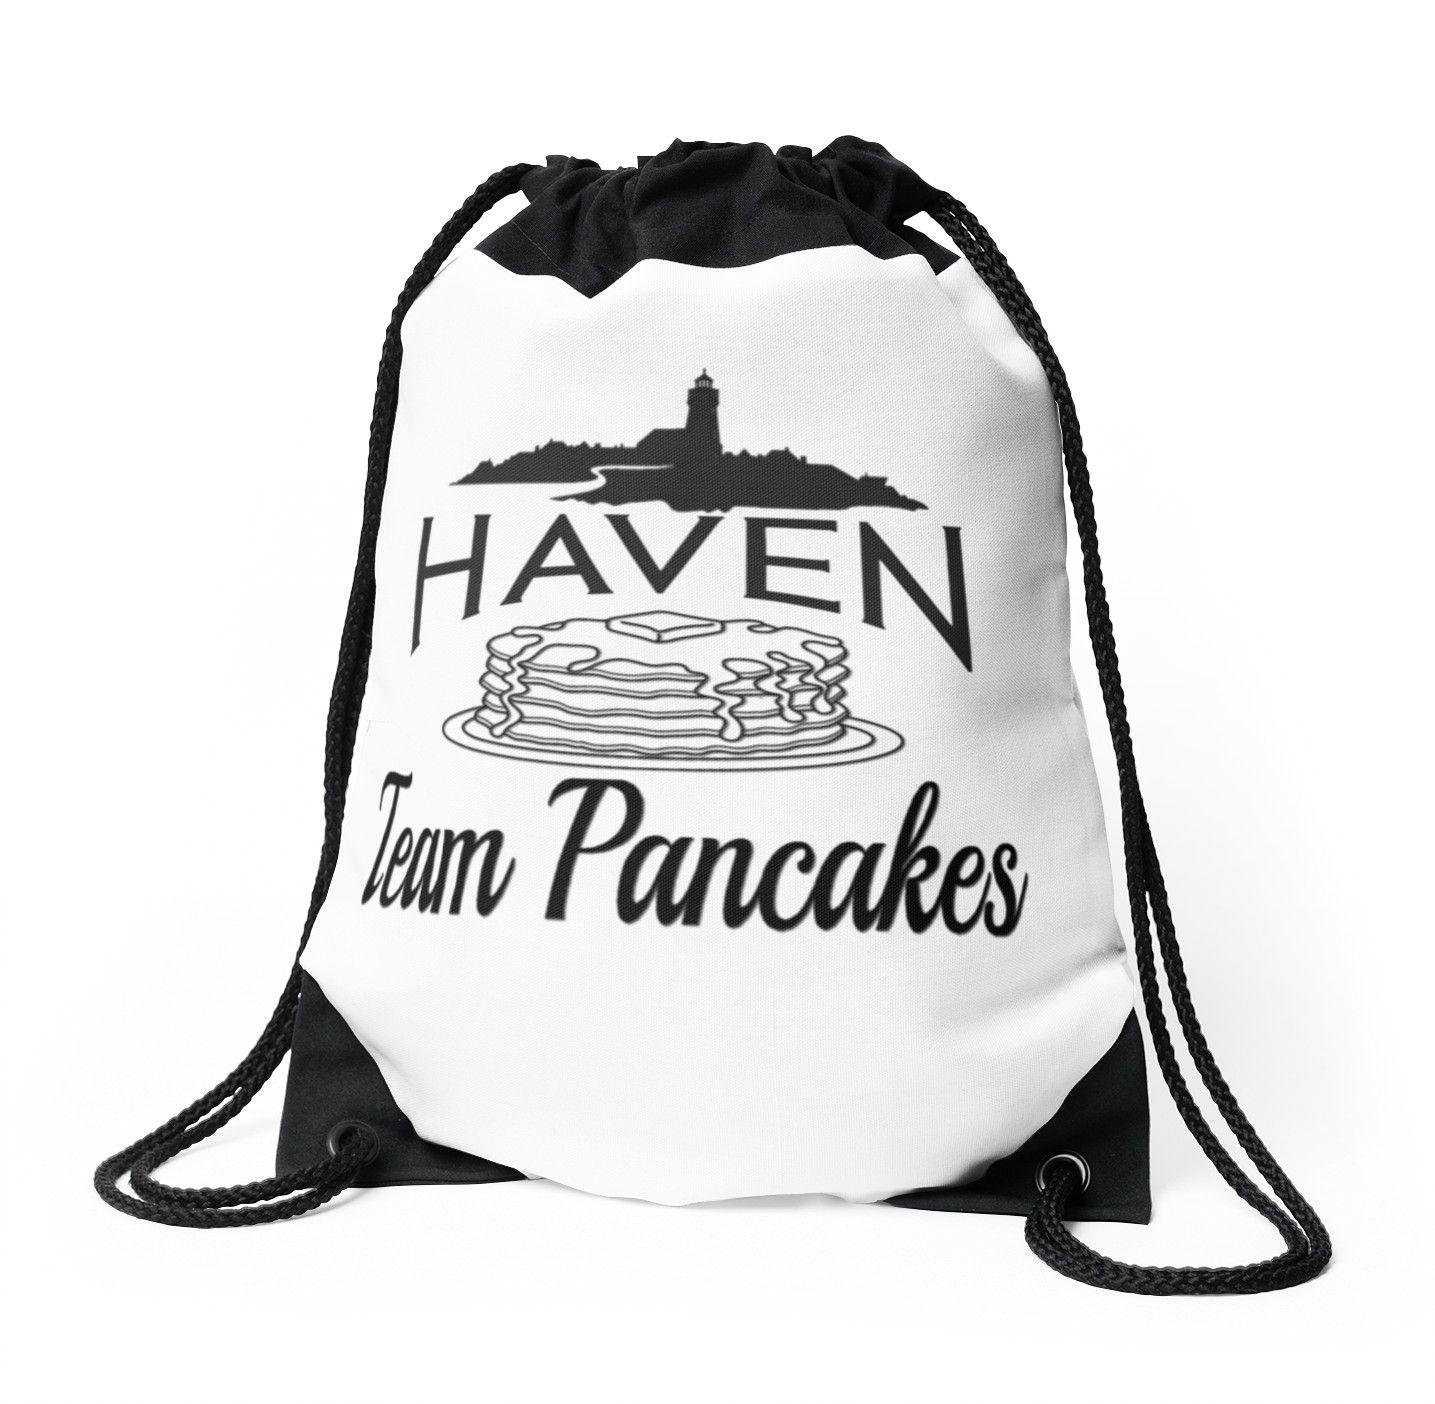 Haven Syfy Inspired Drawstring Bag | Haven Team Pancakes